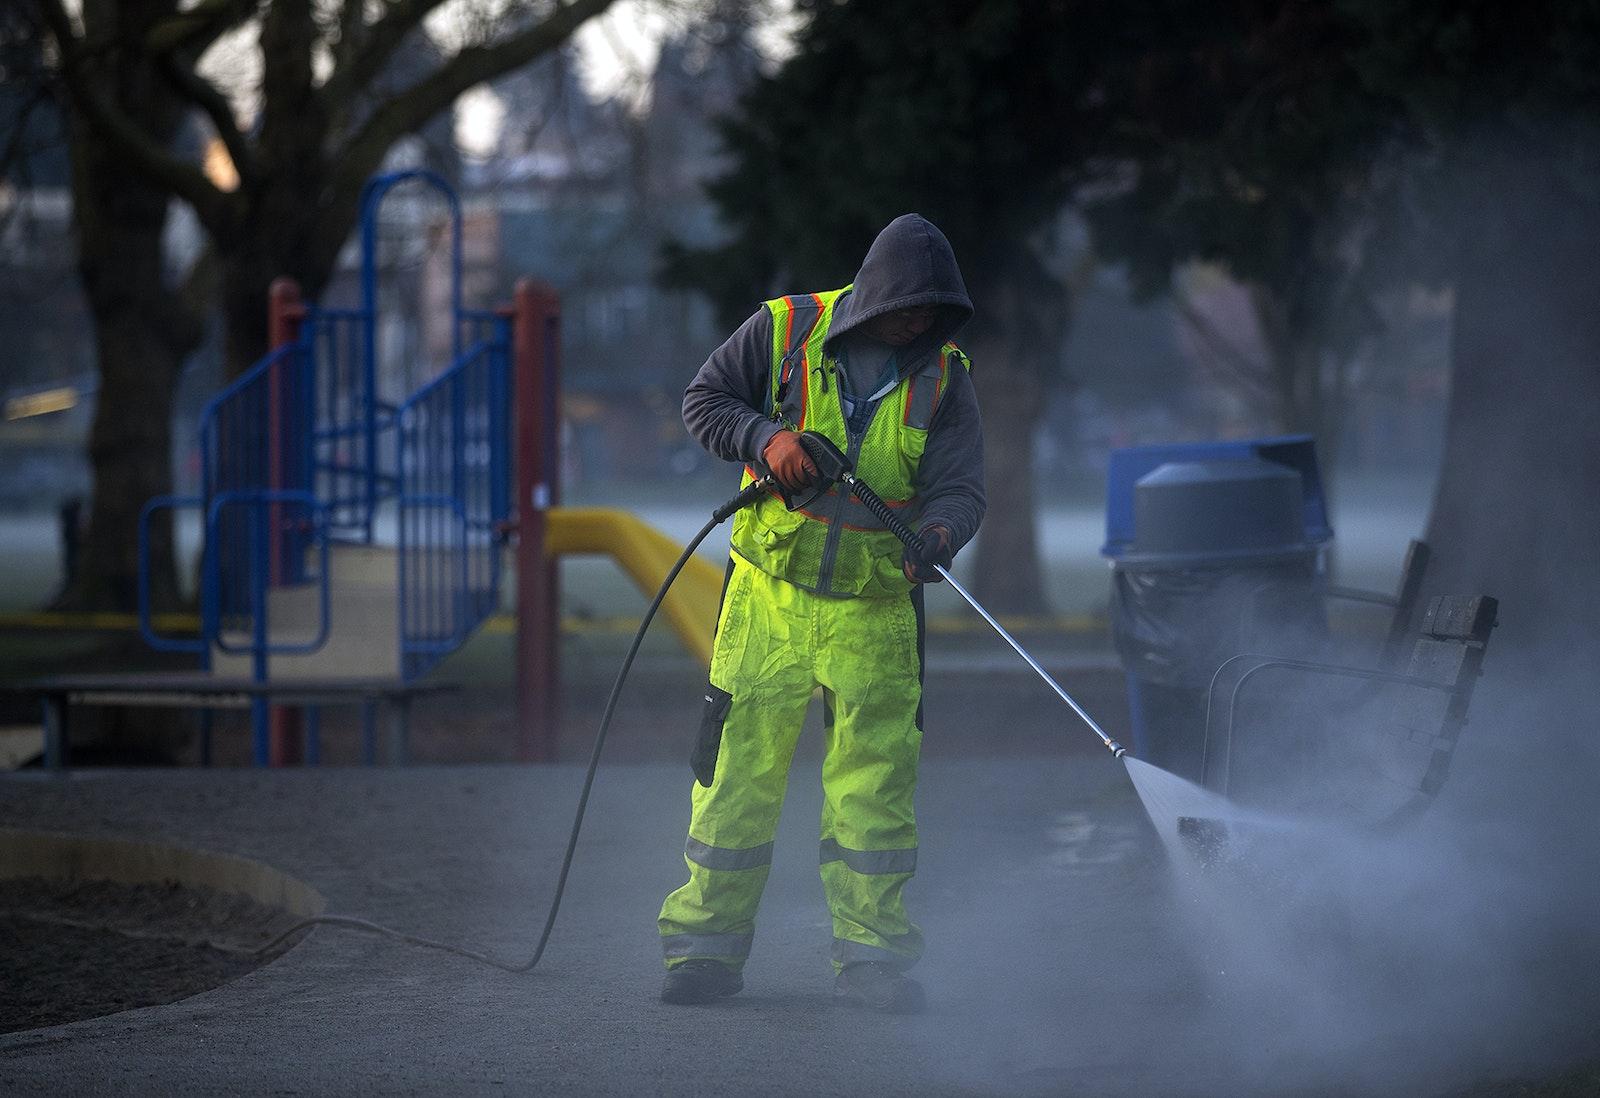 A utility worker sprays water on a swing-set